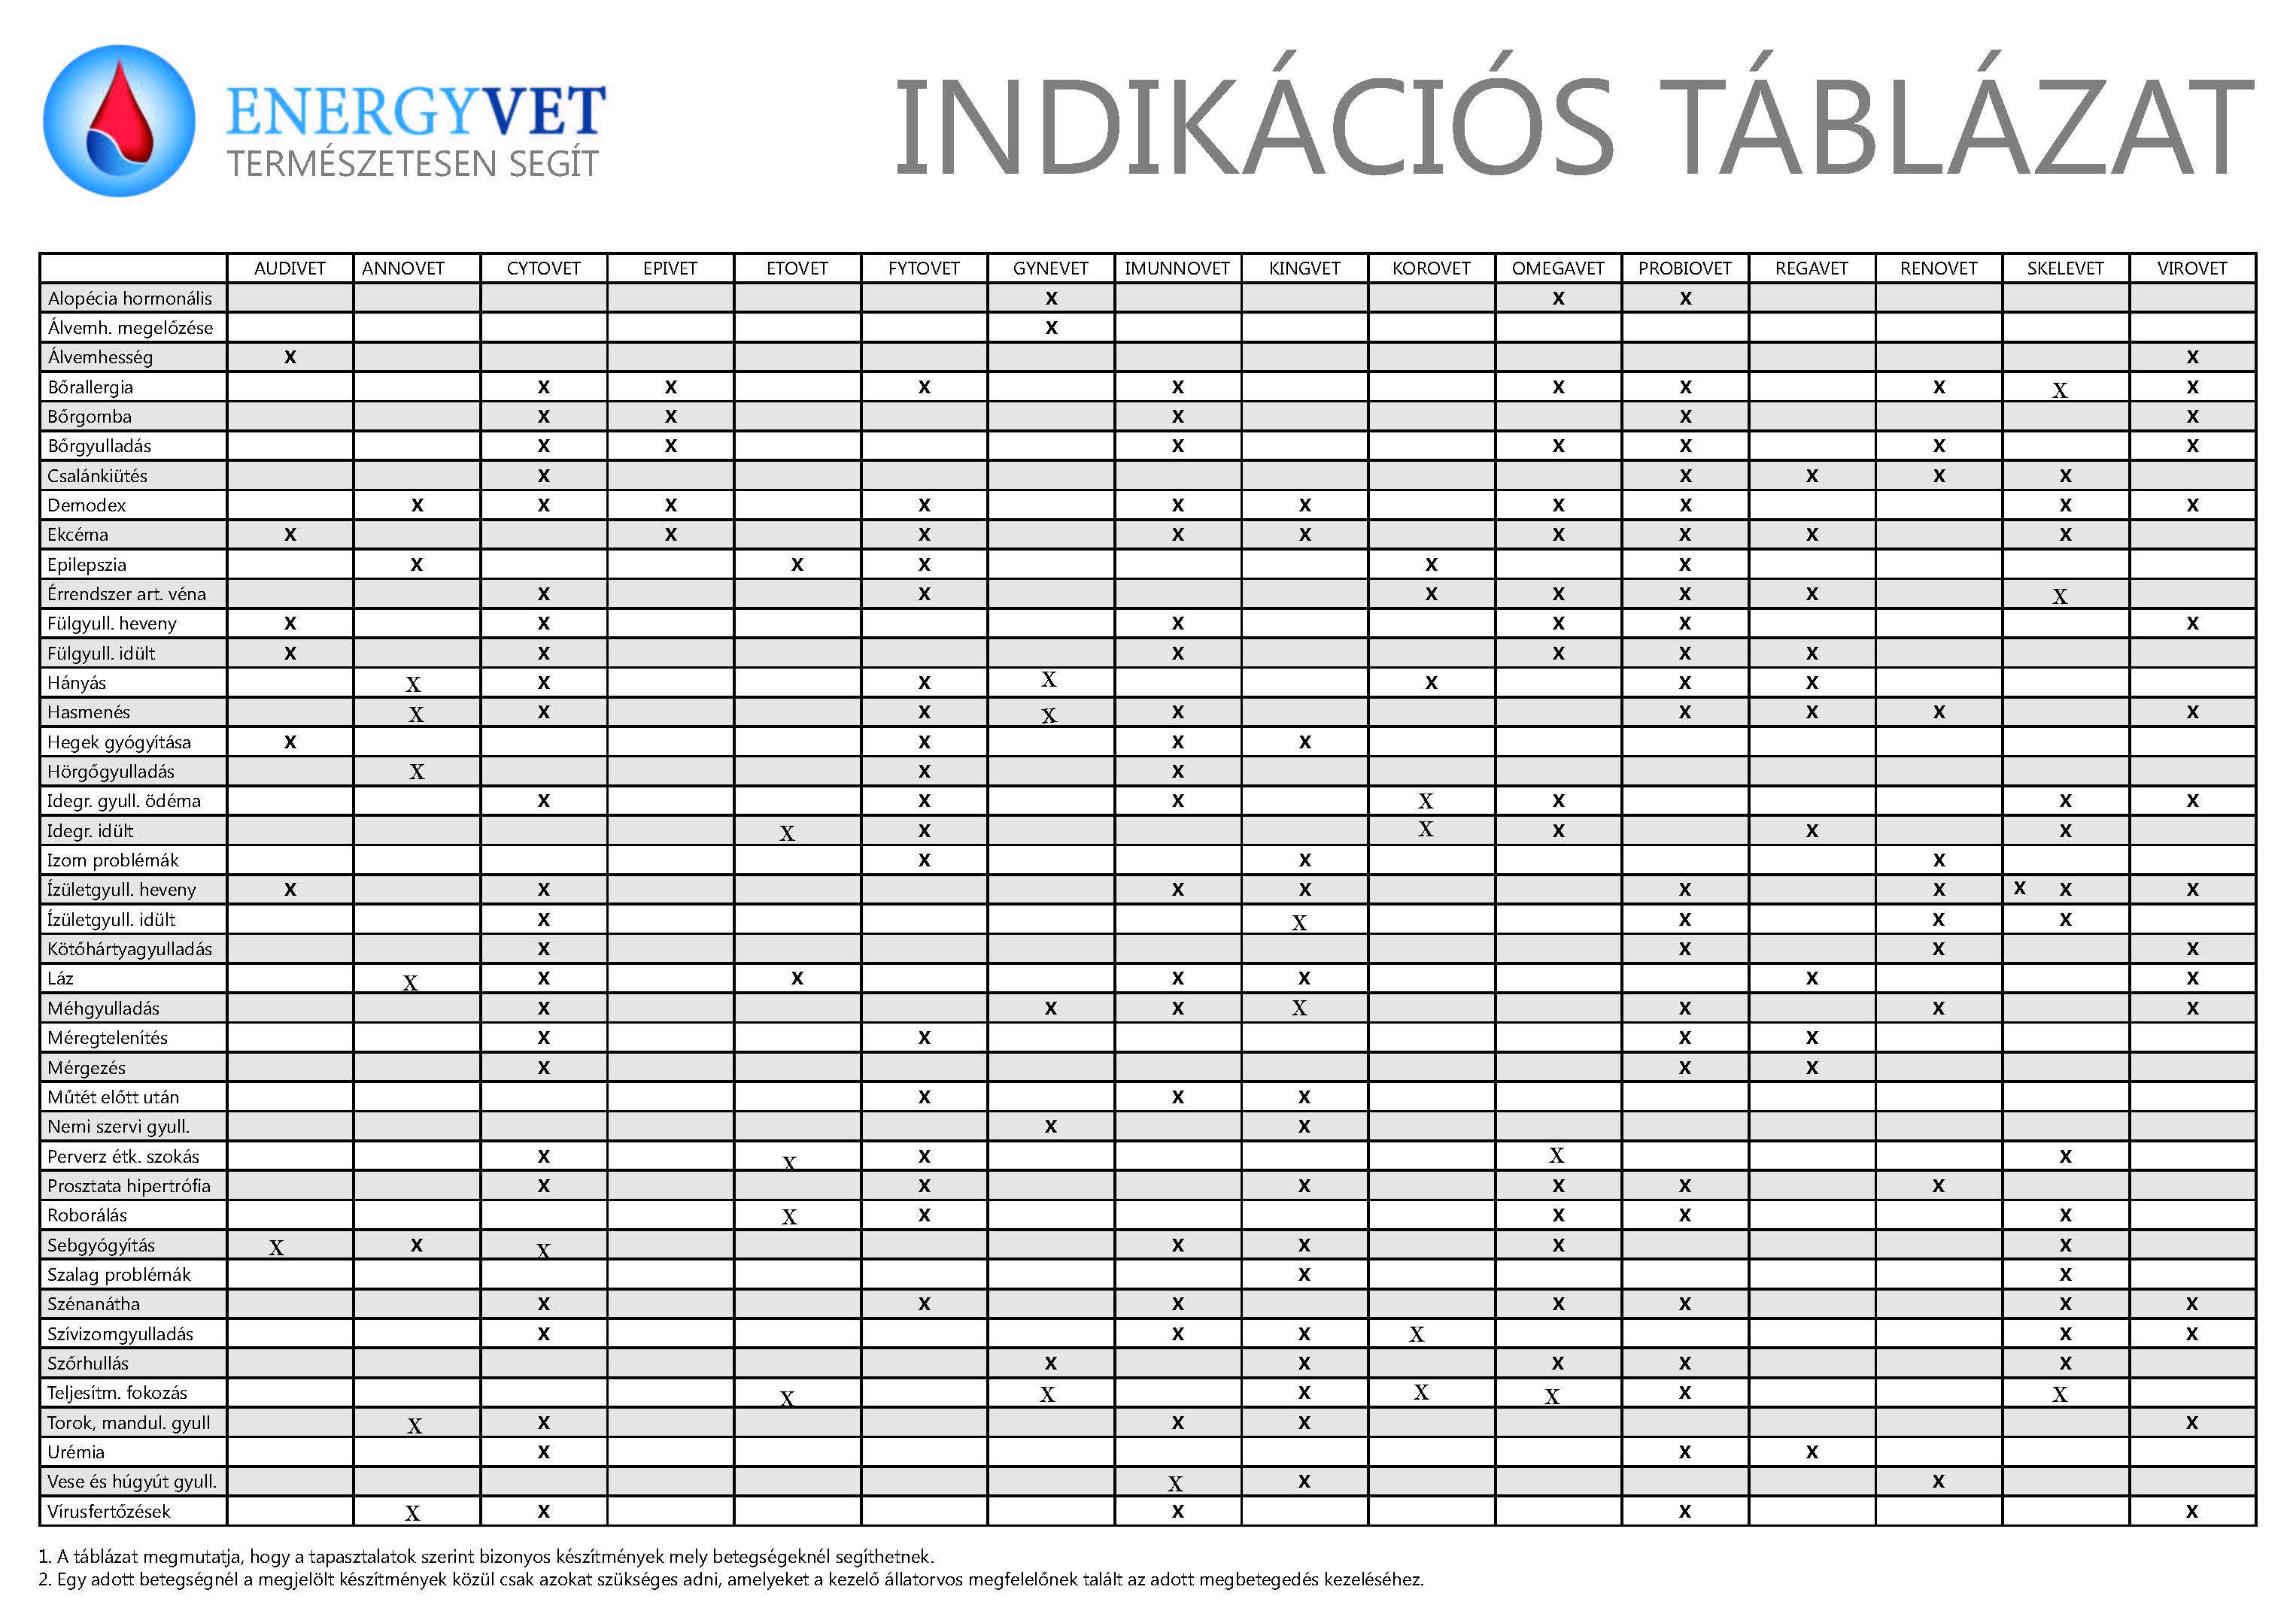 energyvet_indikacios_tablazat